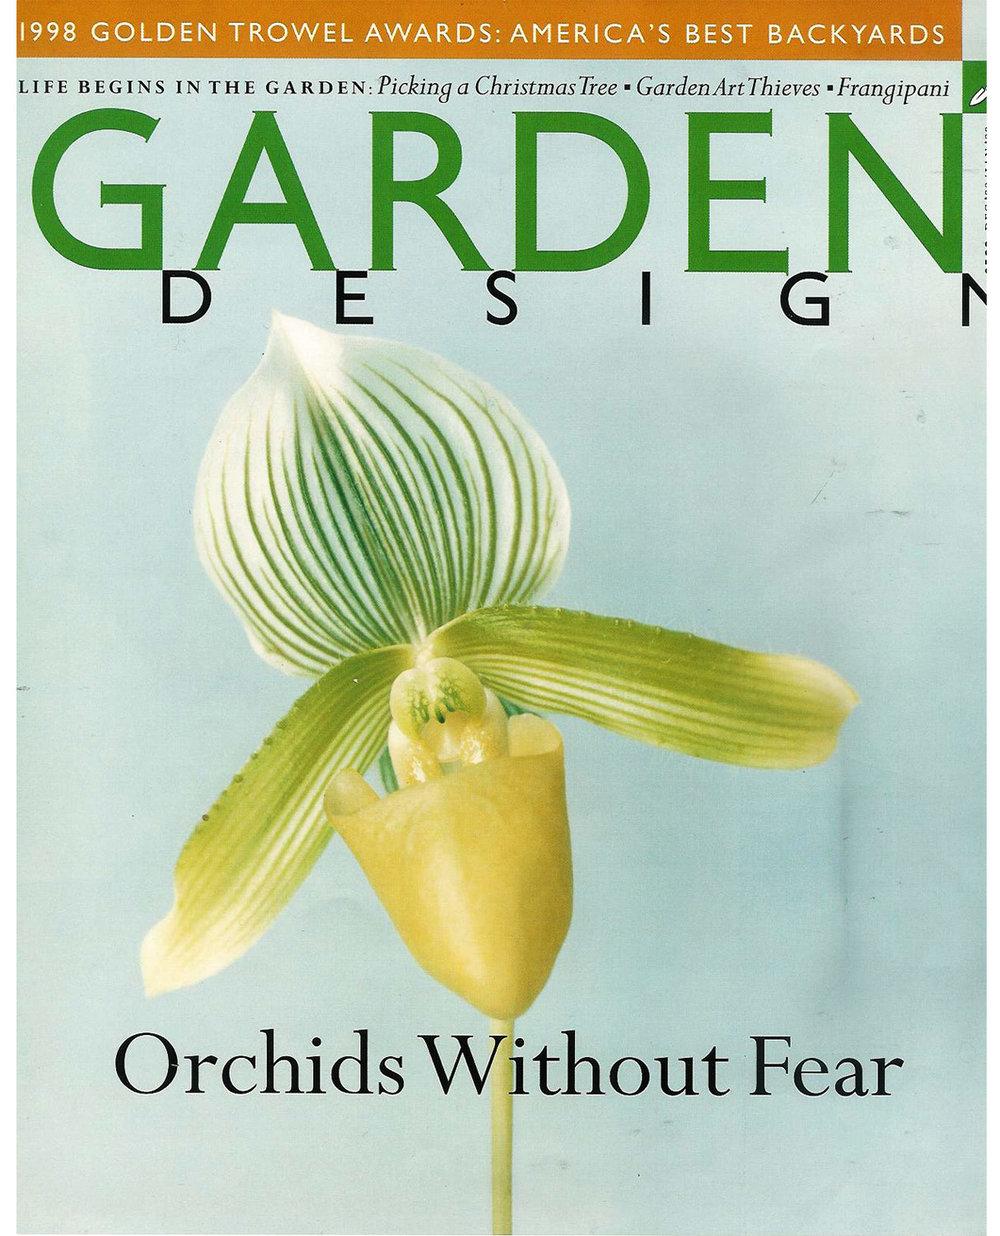 gardendesign-cover_alemanmoore.jpg